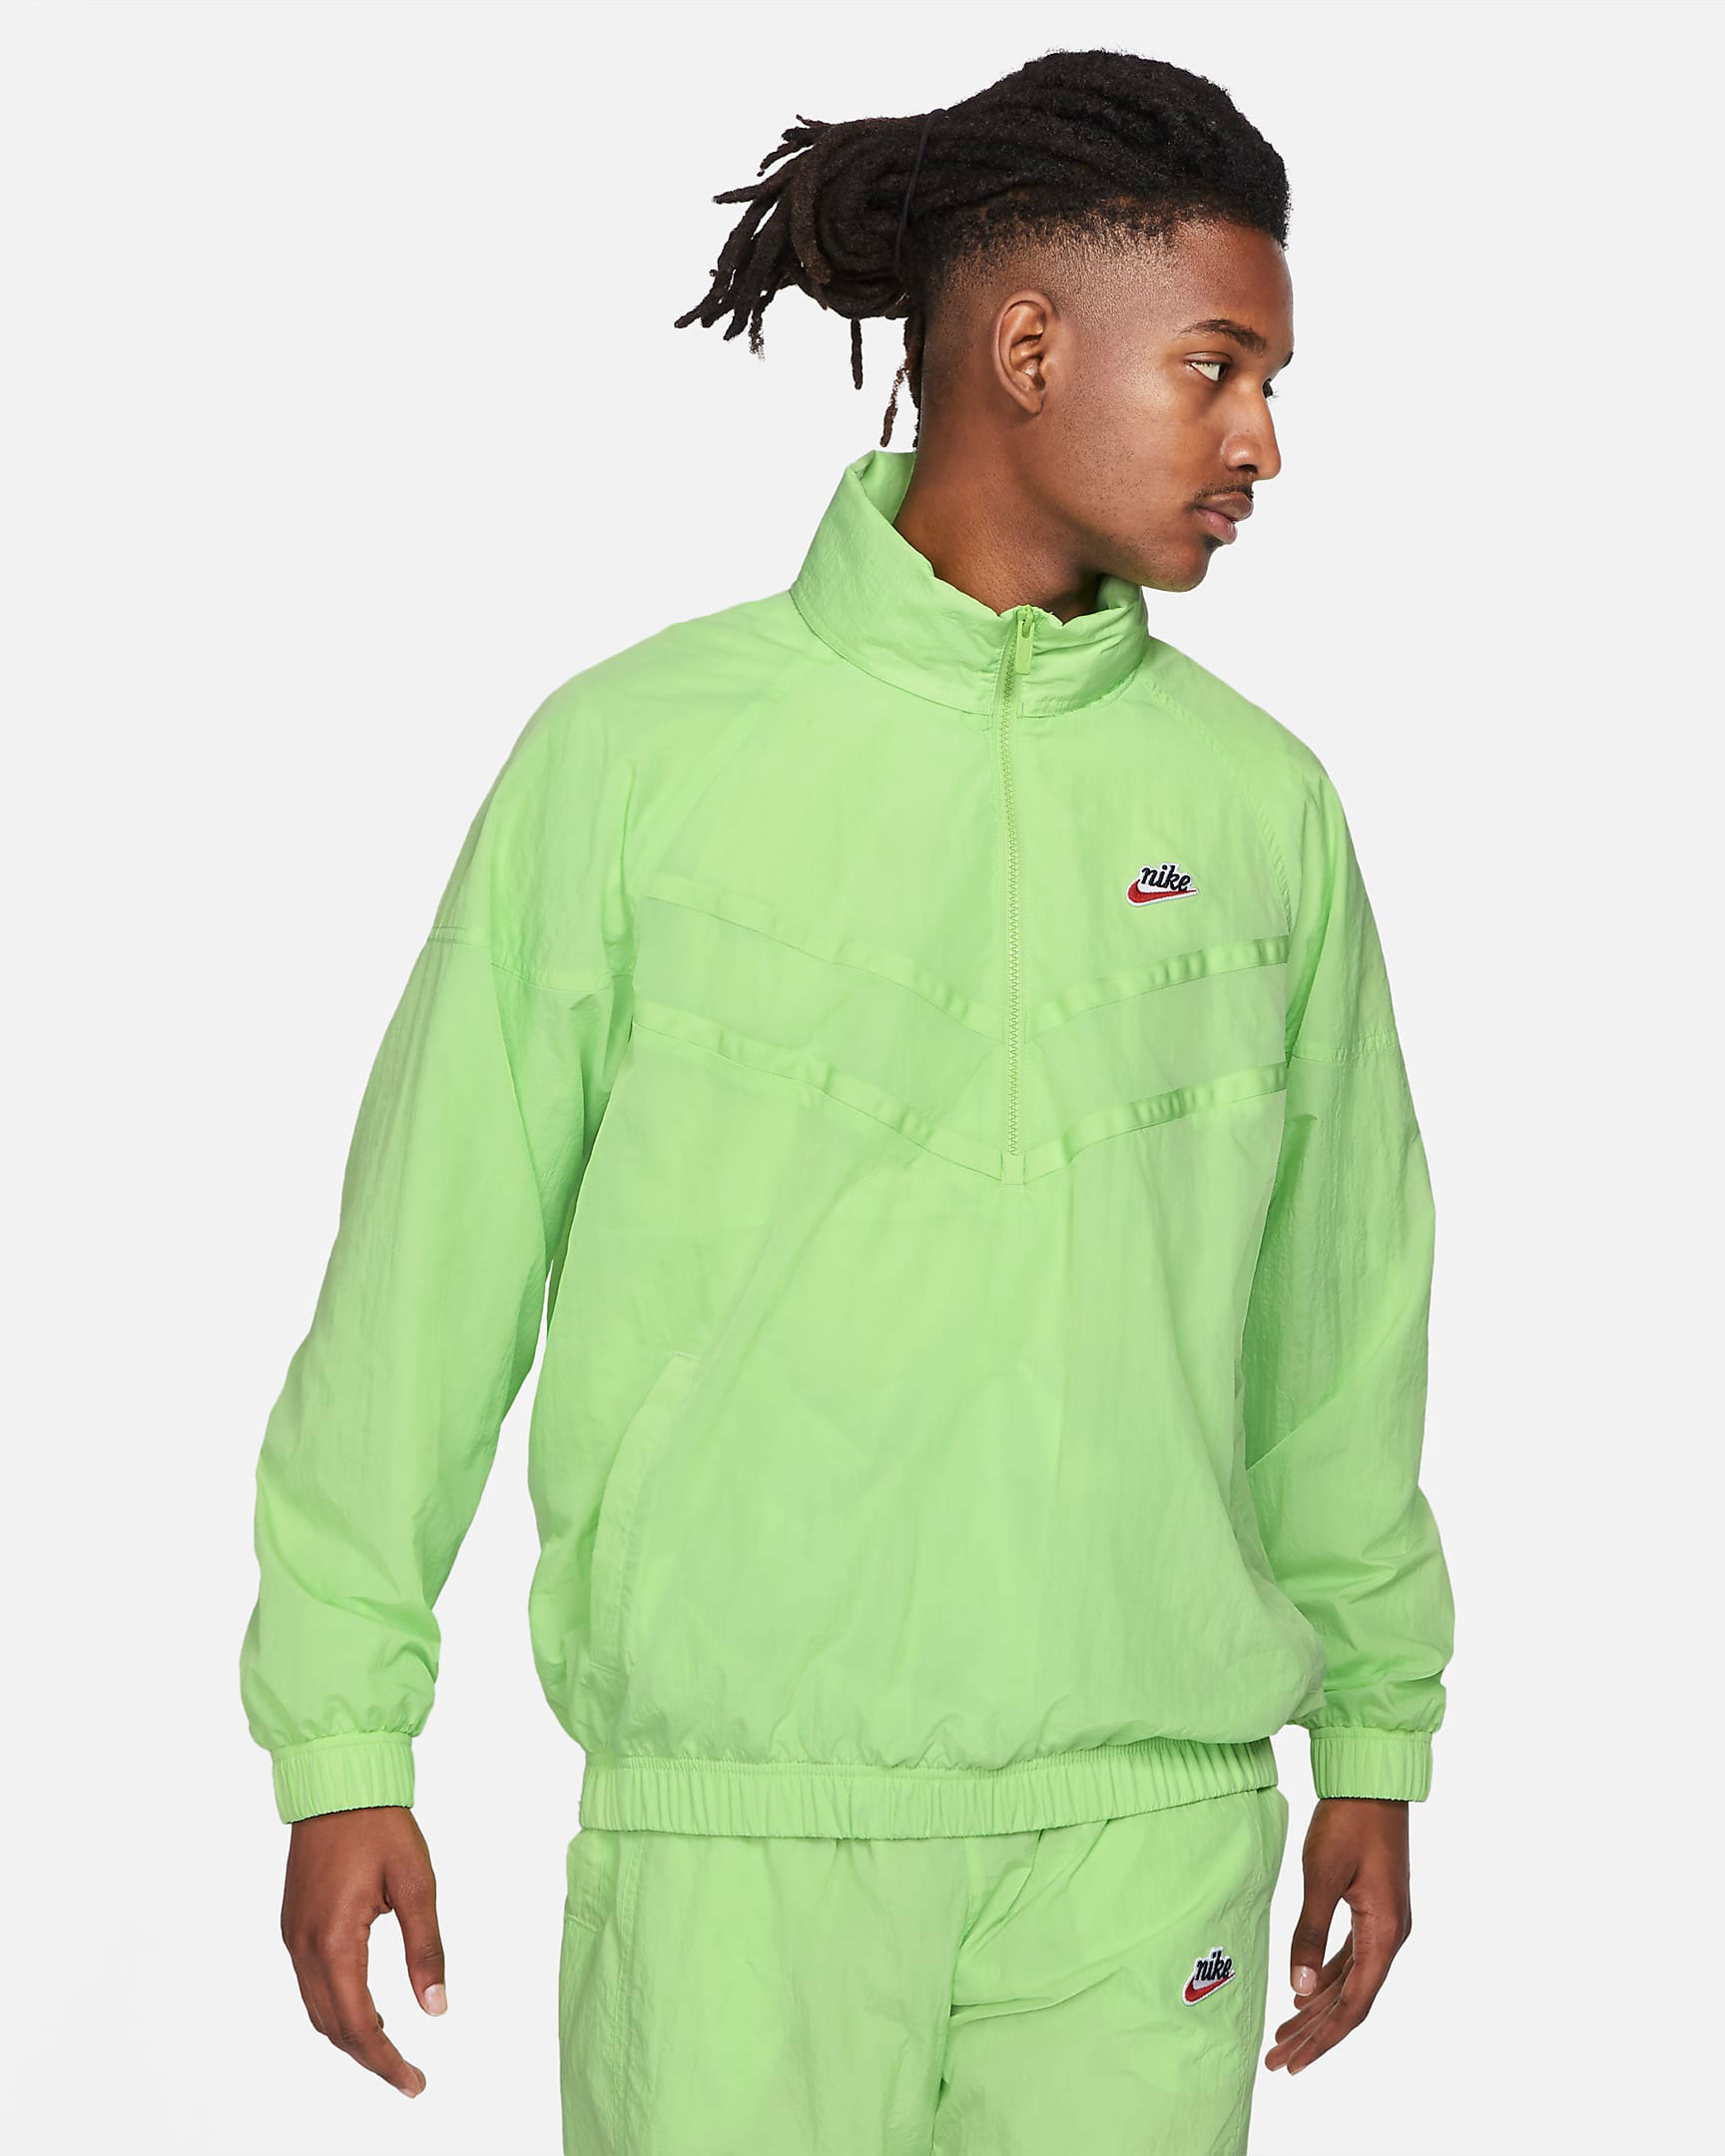 nike-heritage-half-zip-windrunner-jacket-key-lime